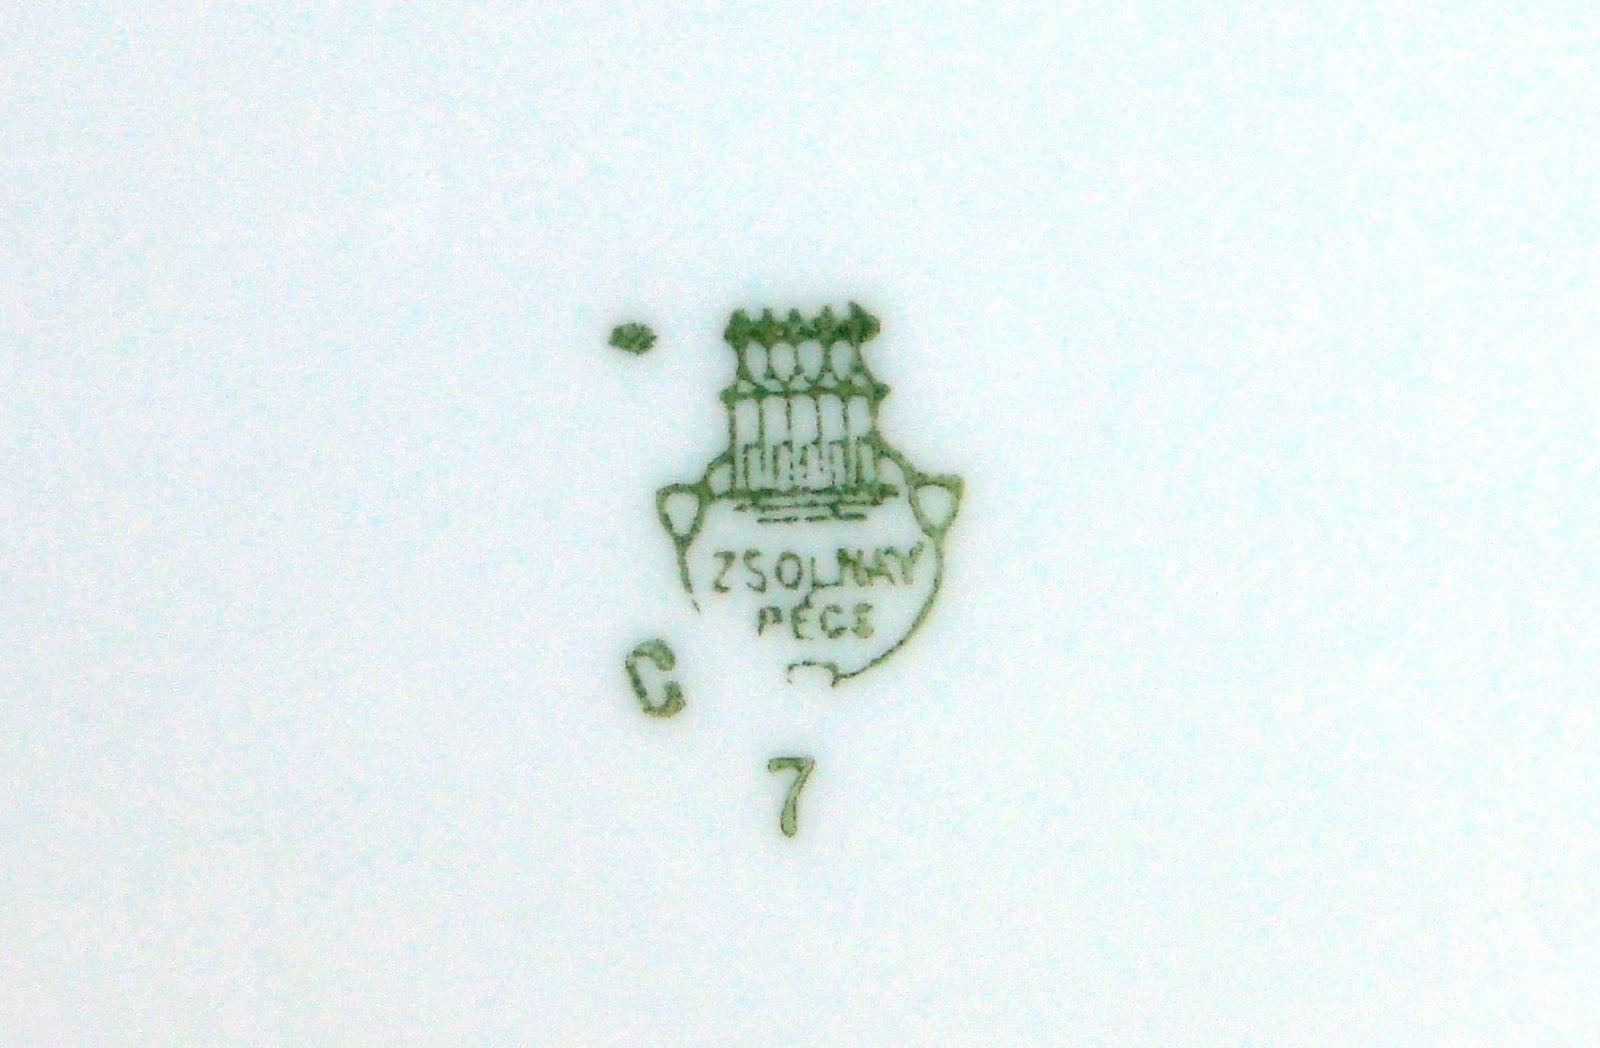 DSC09676.JPG (1600�1048)